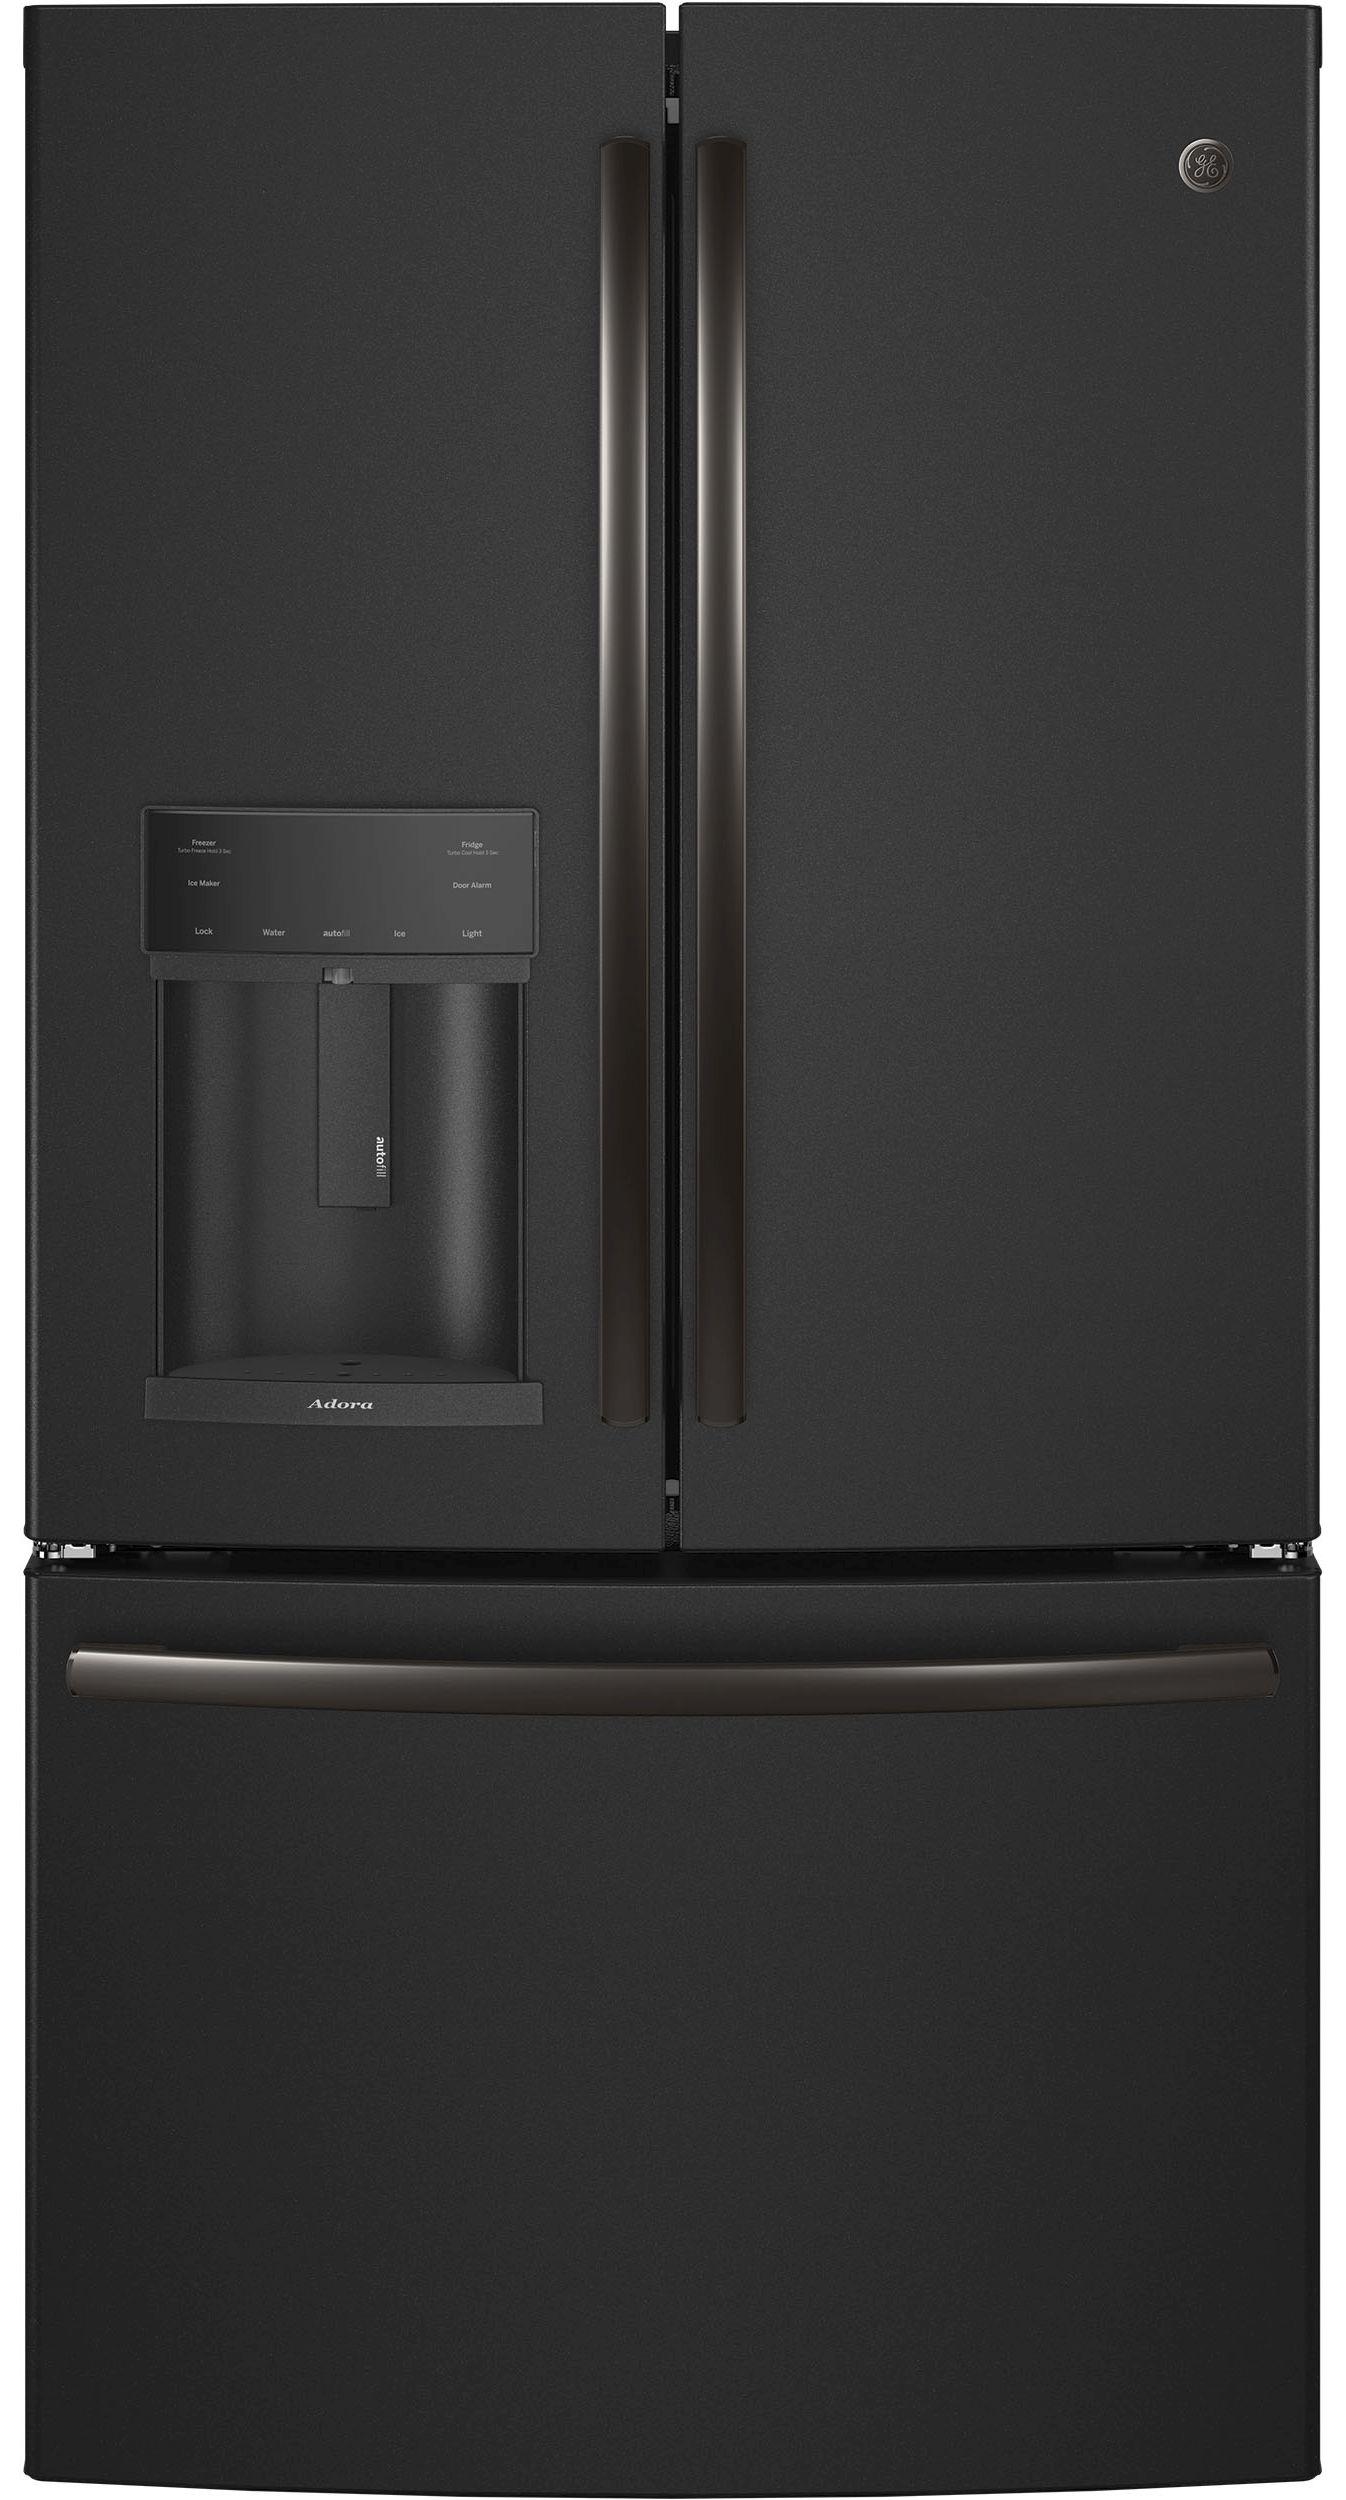 French Door Refrigerator Chesnee Sc Spartanburg Sc Greenville Sc